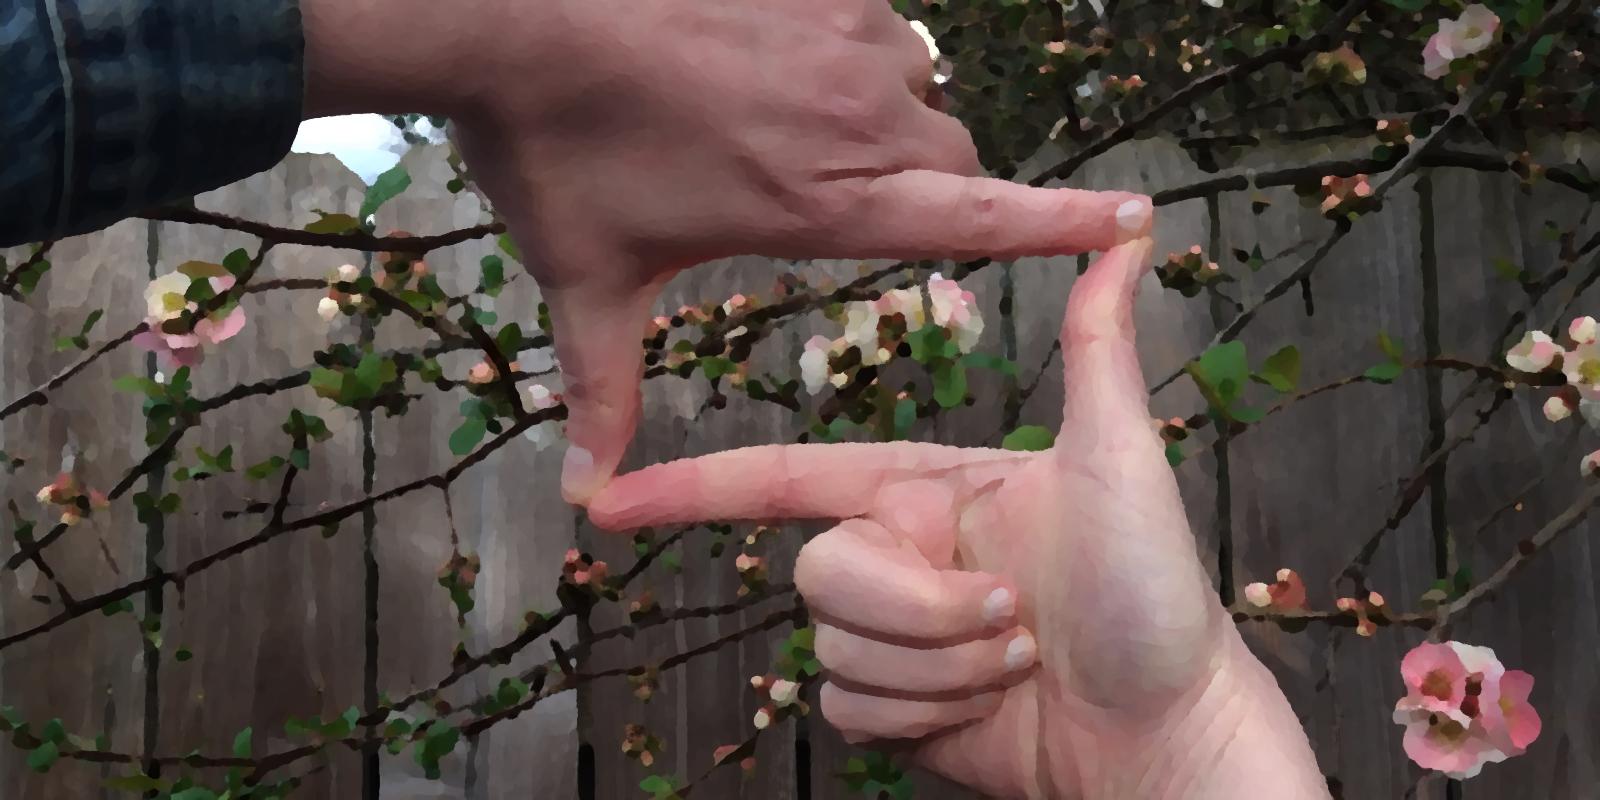 Hands form a frame around flowers.